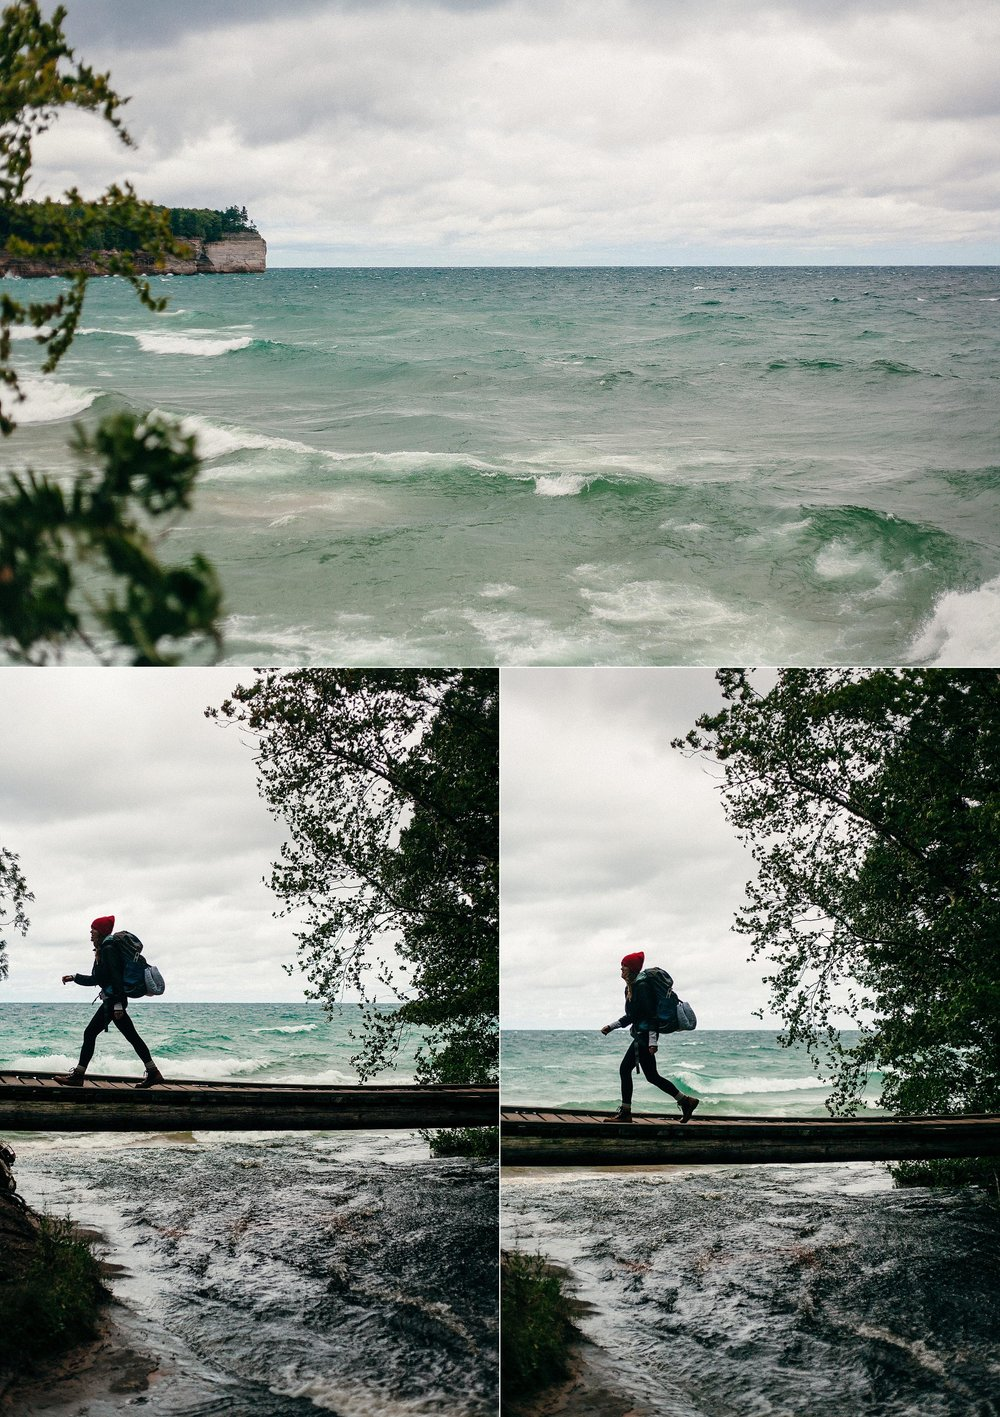 backpacking-michigan-upper-peninsula-pictured-rocks-camping-lake-superior_0033.jpg